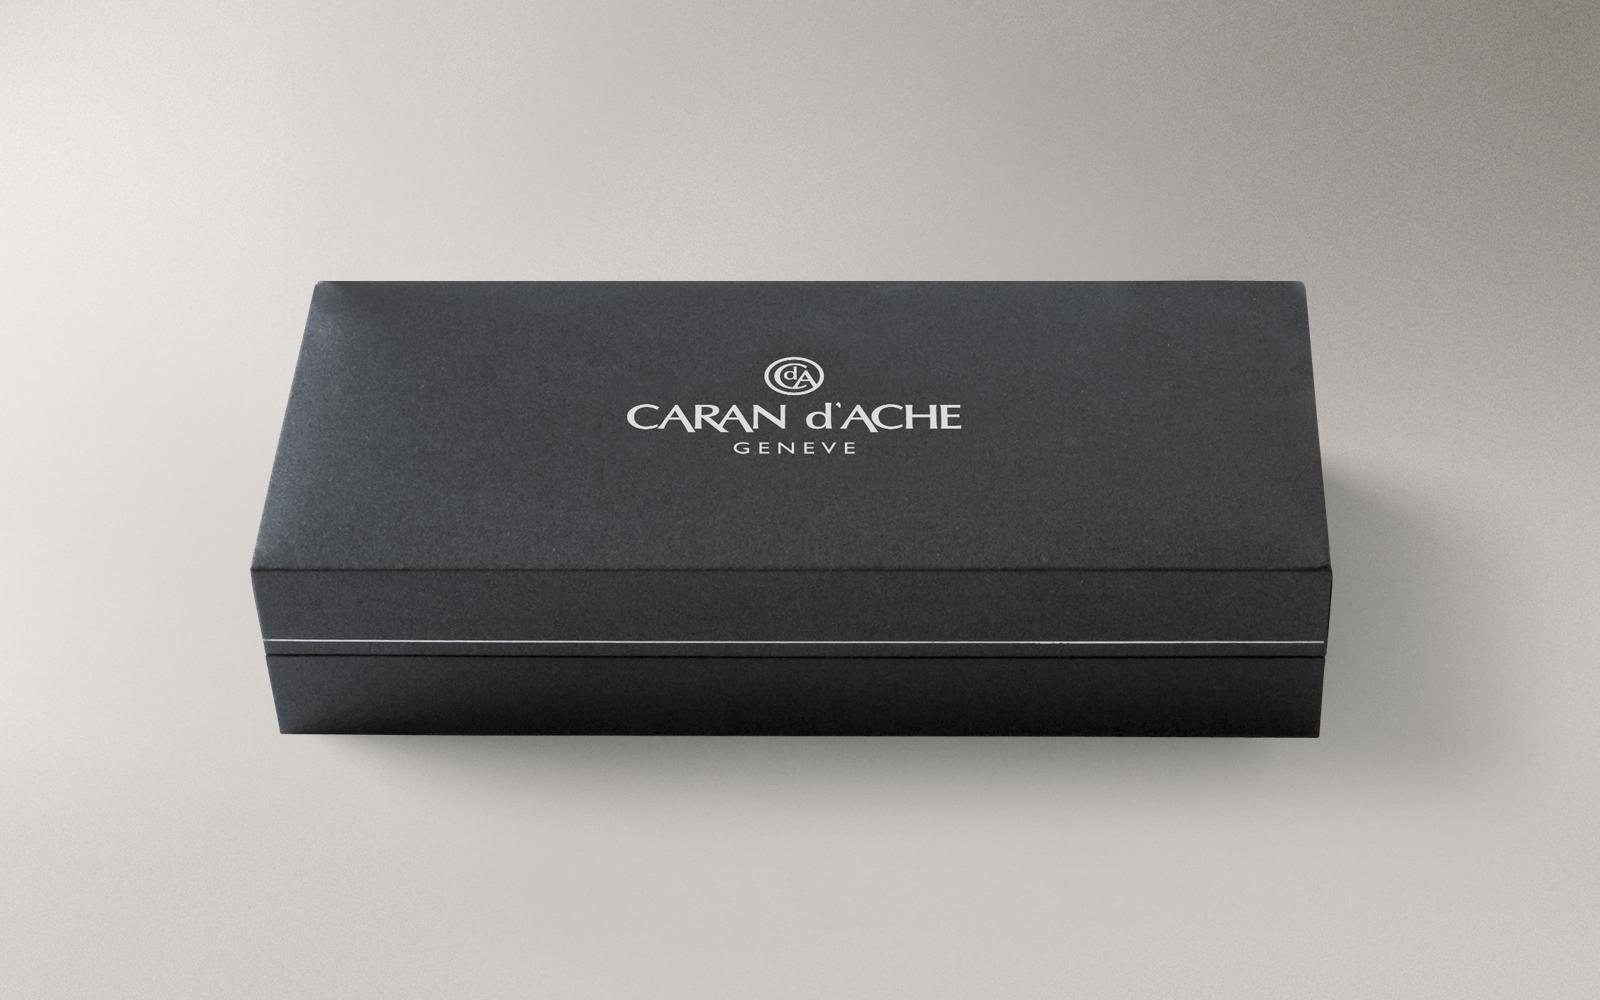 Carandache Leman - Caviar SP, перьевая ручка, F